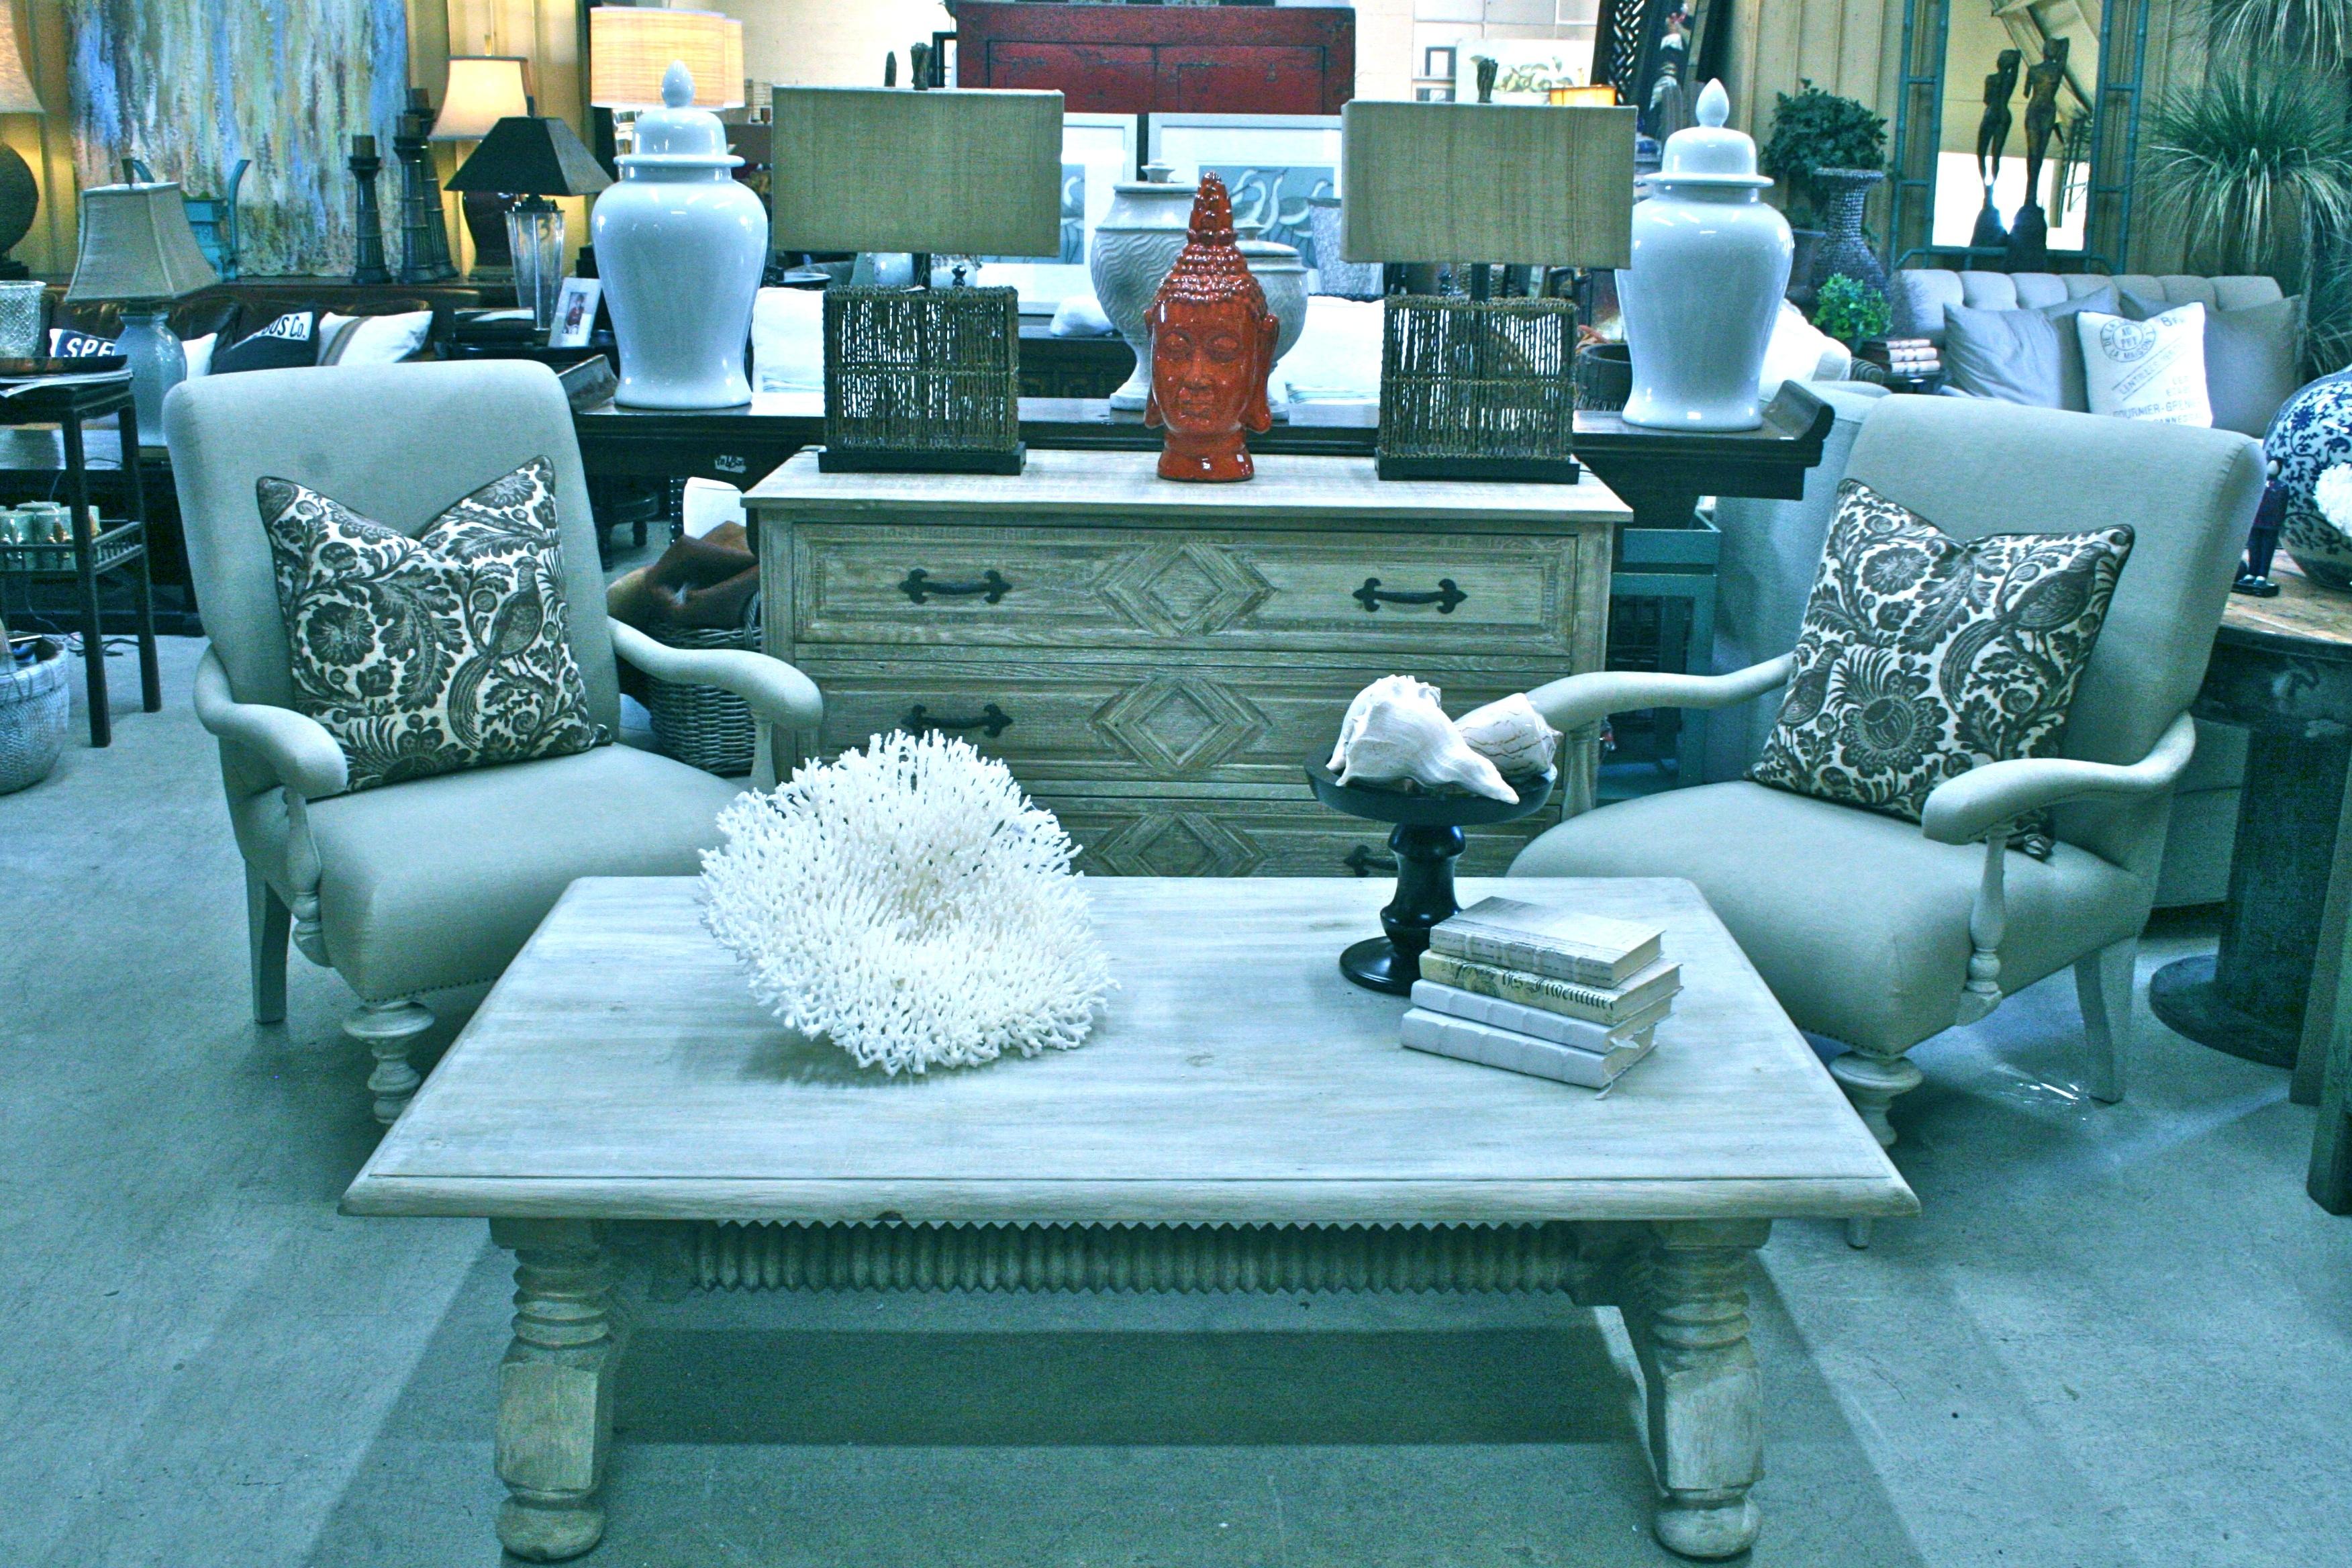 HtgT Furniture image 71